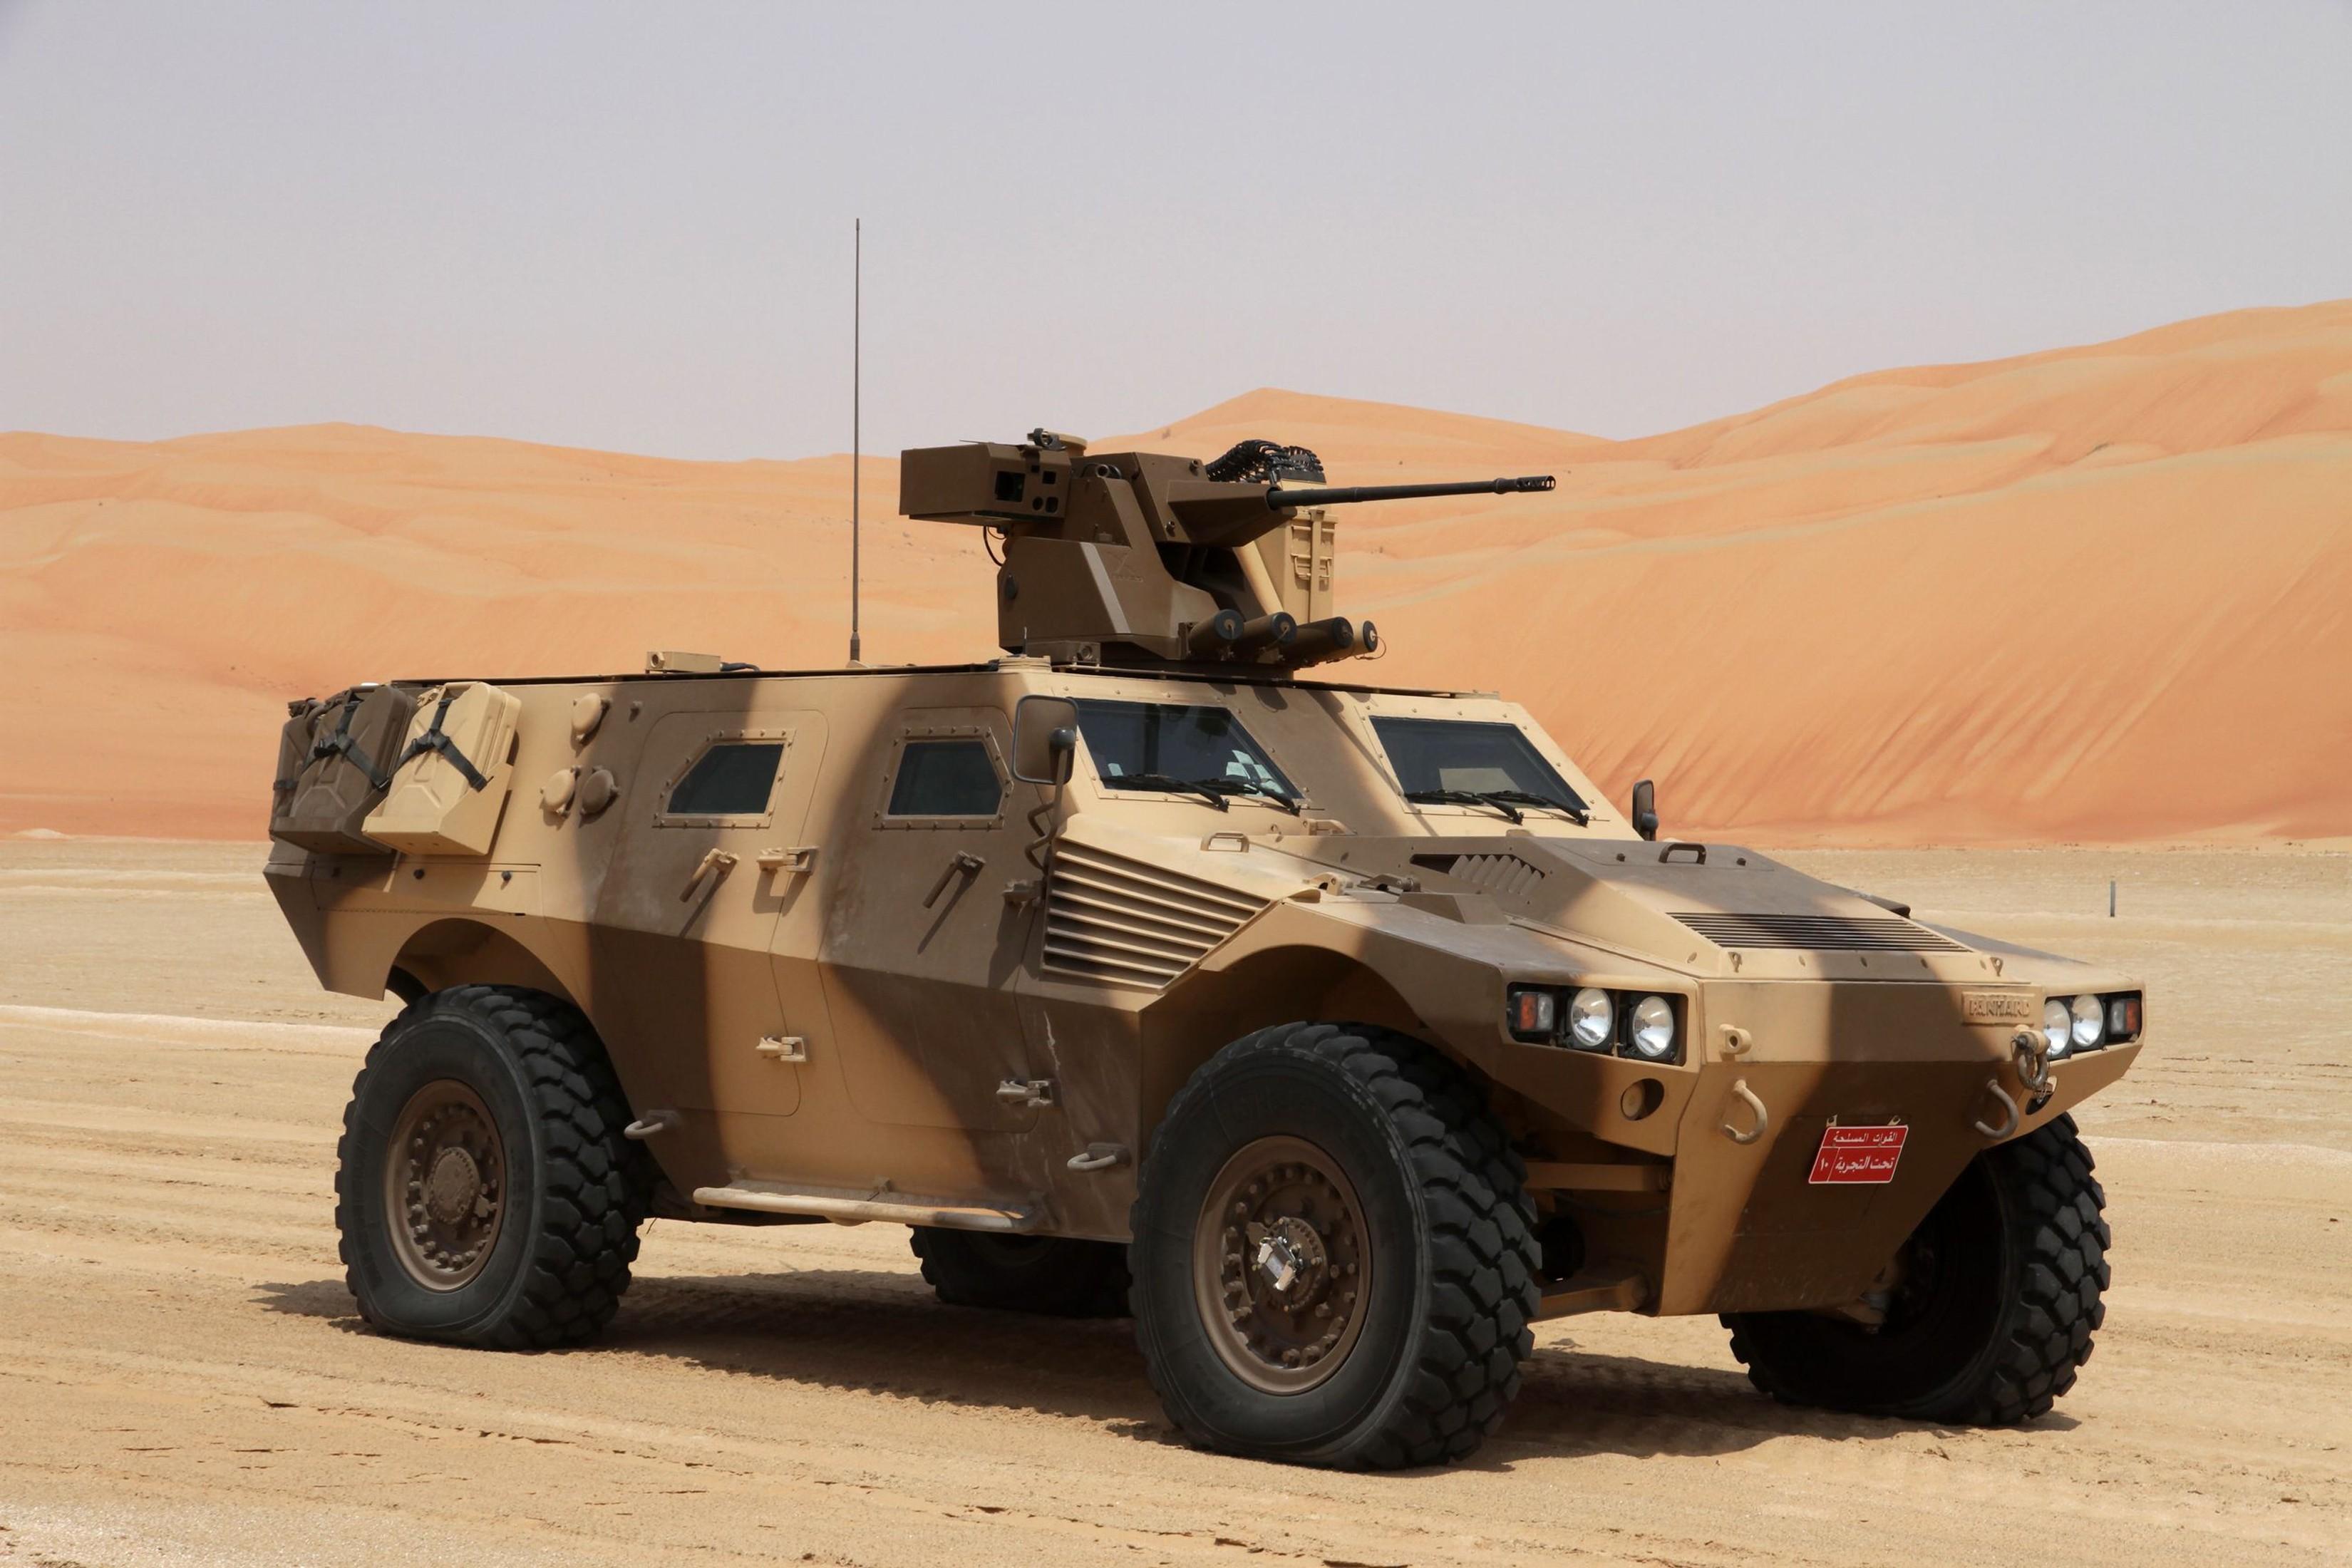 Hd wallpaper ios - Wallpaper Panhard Vbr Rx20 Combat Vehicles French Army